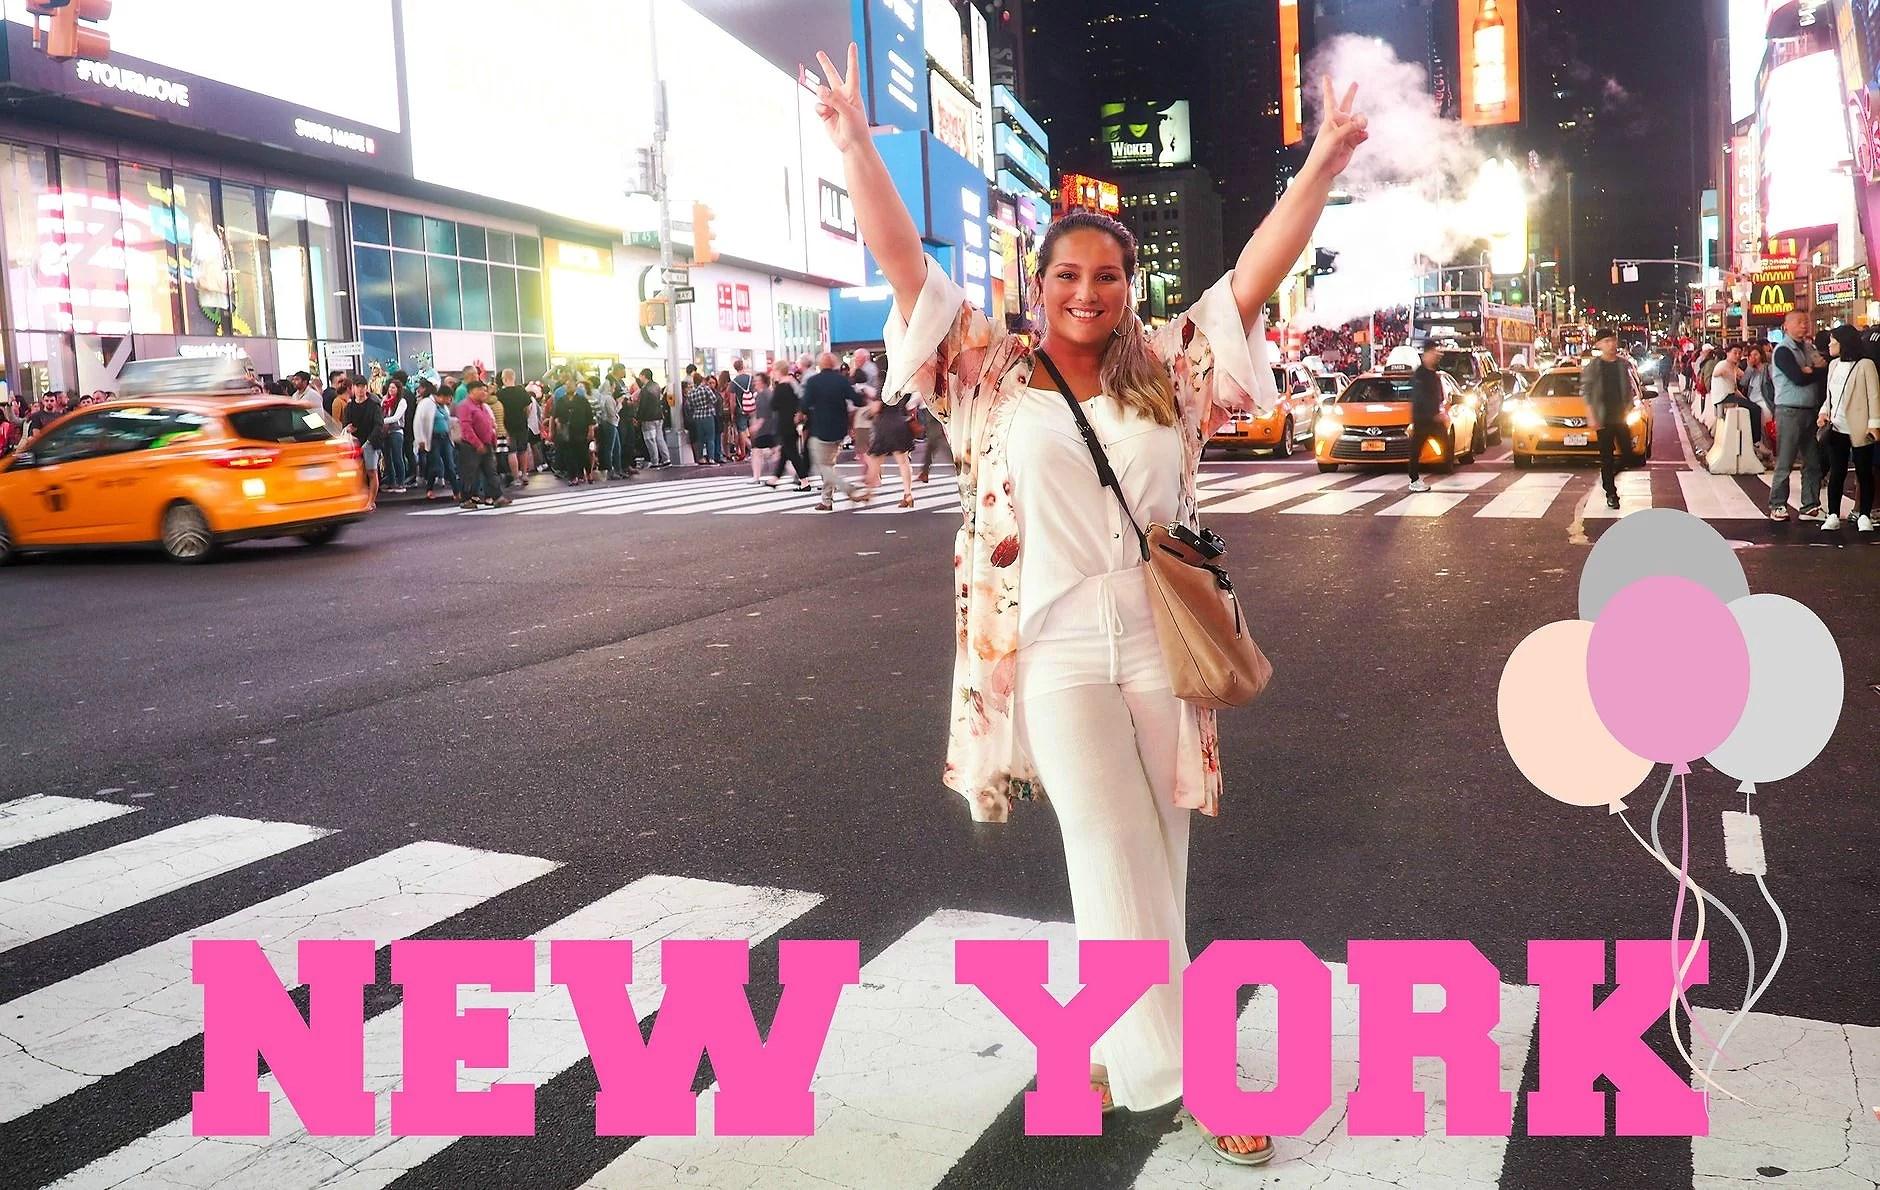 VIDEOBLOGG: NEW YORK